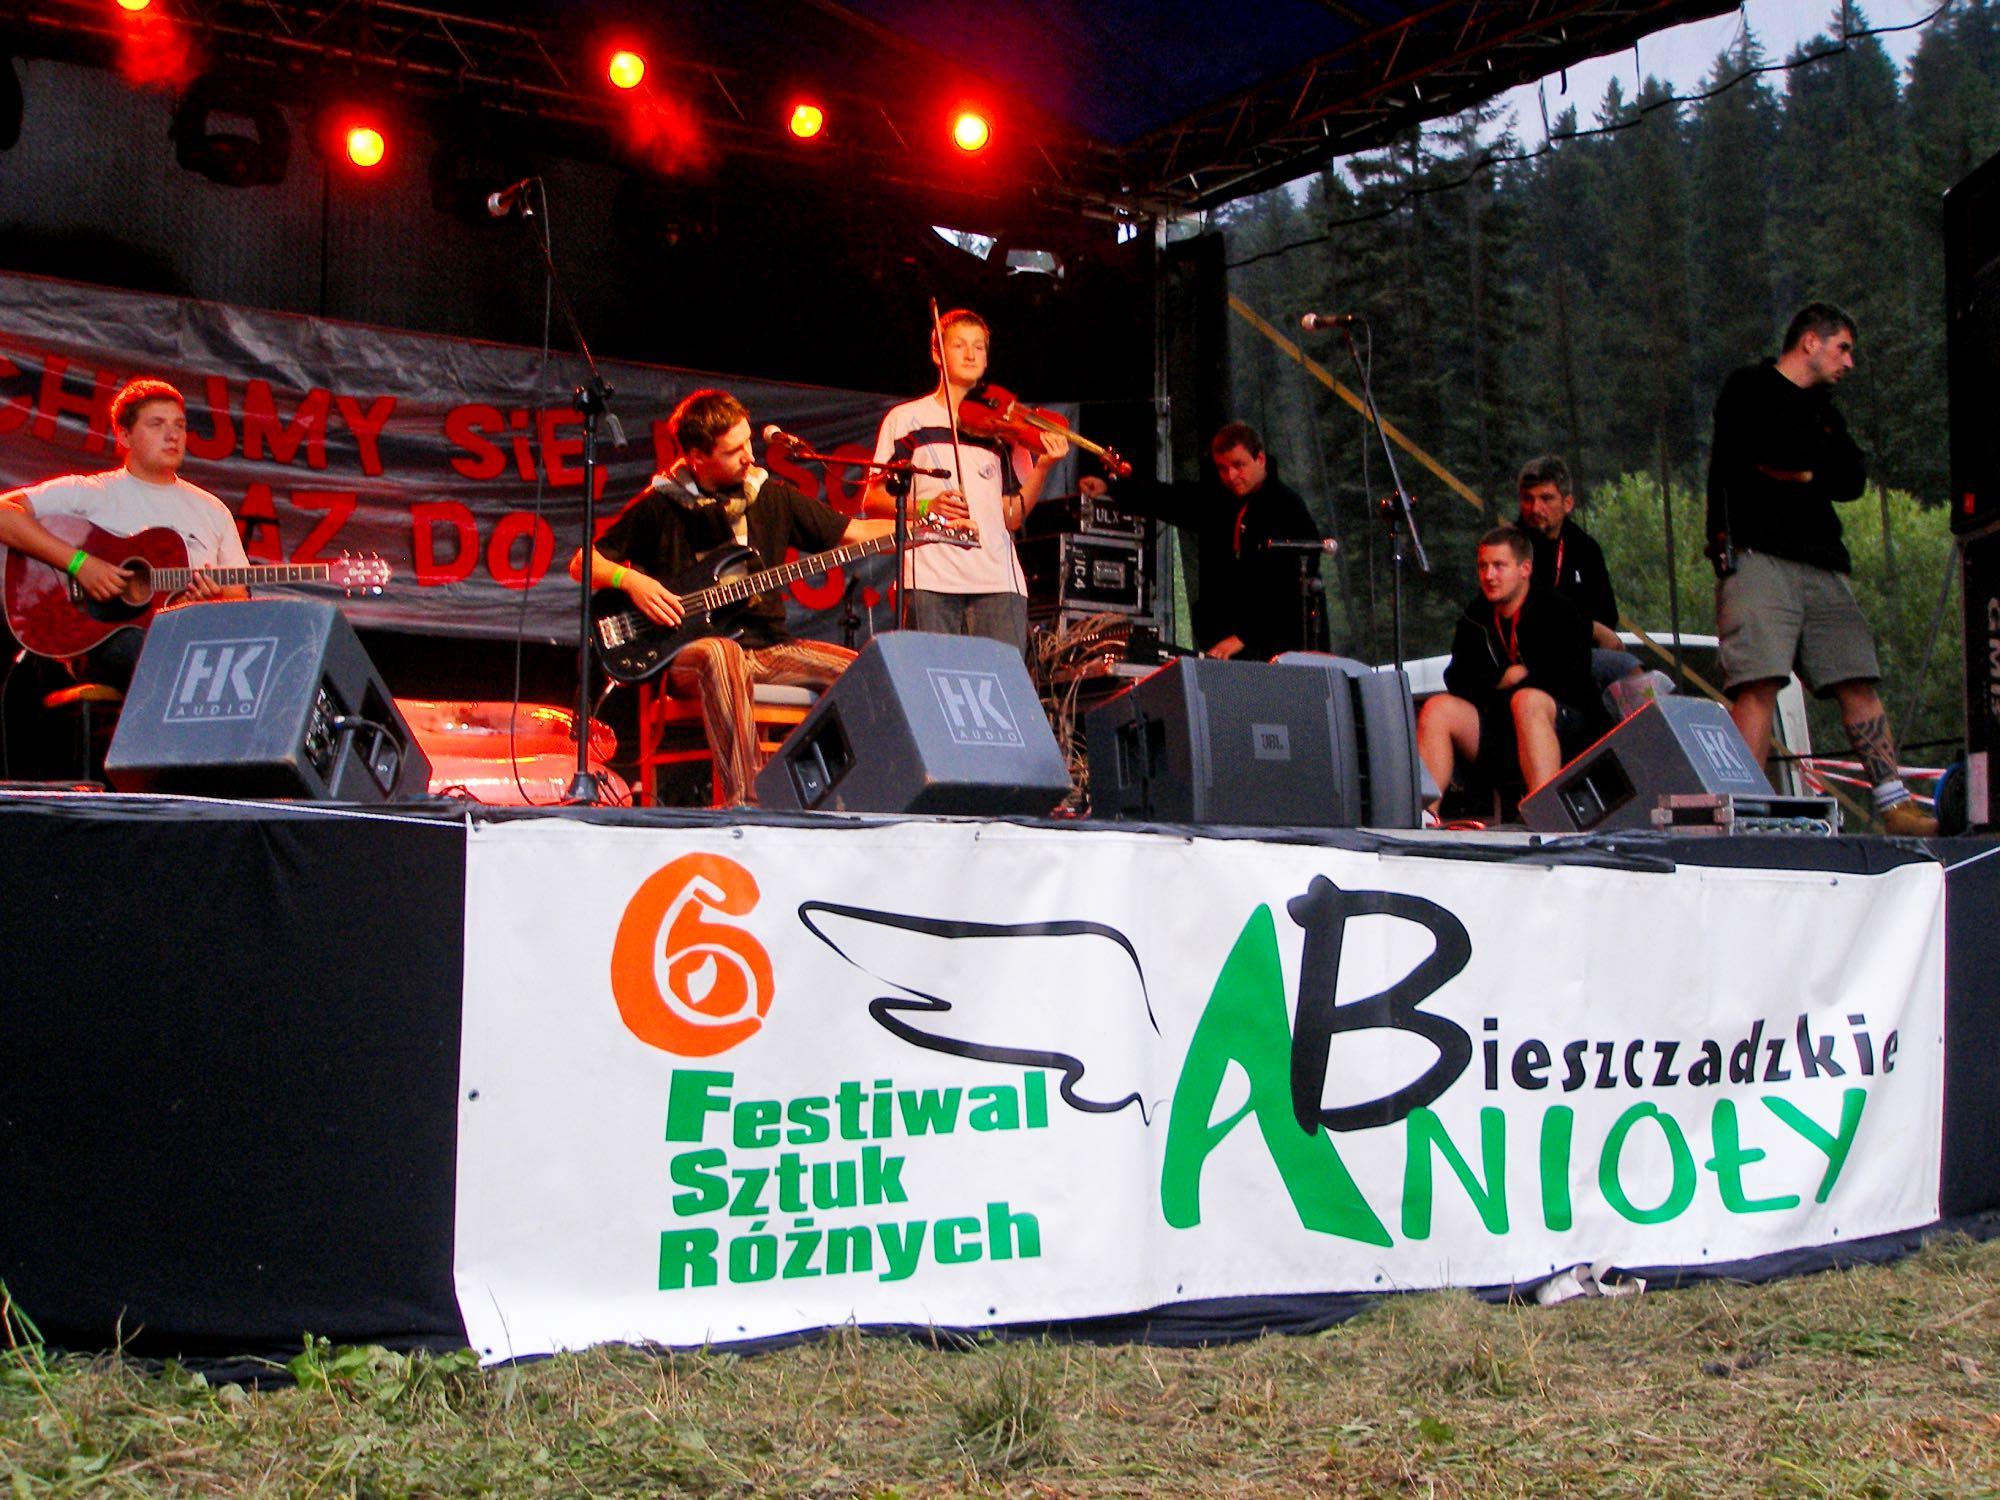 Festiwal w Bieszczadach / fot. Lidia Tul-Chmielewska